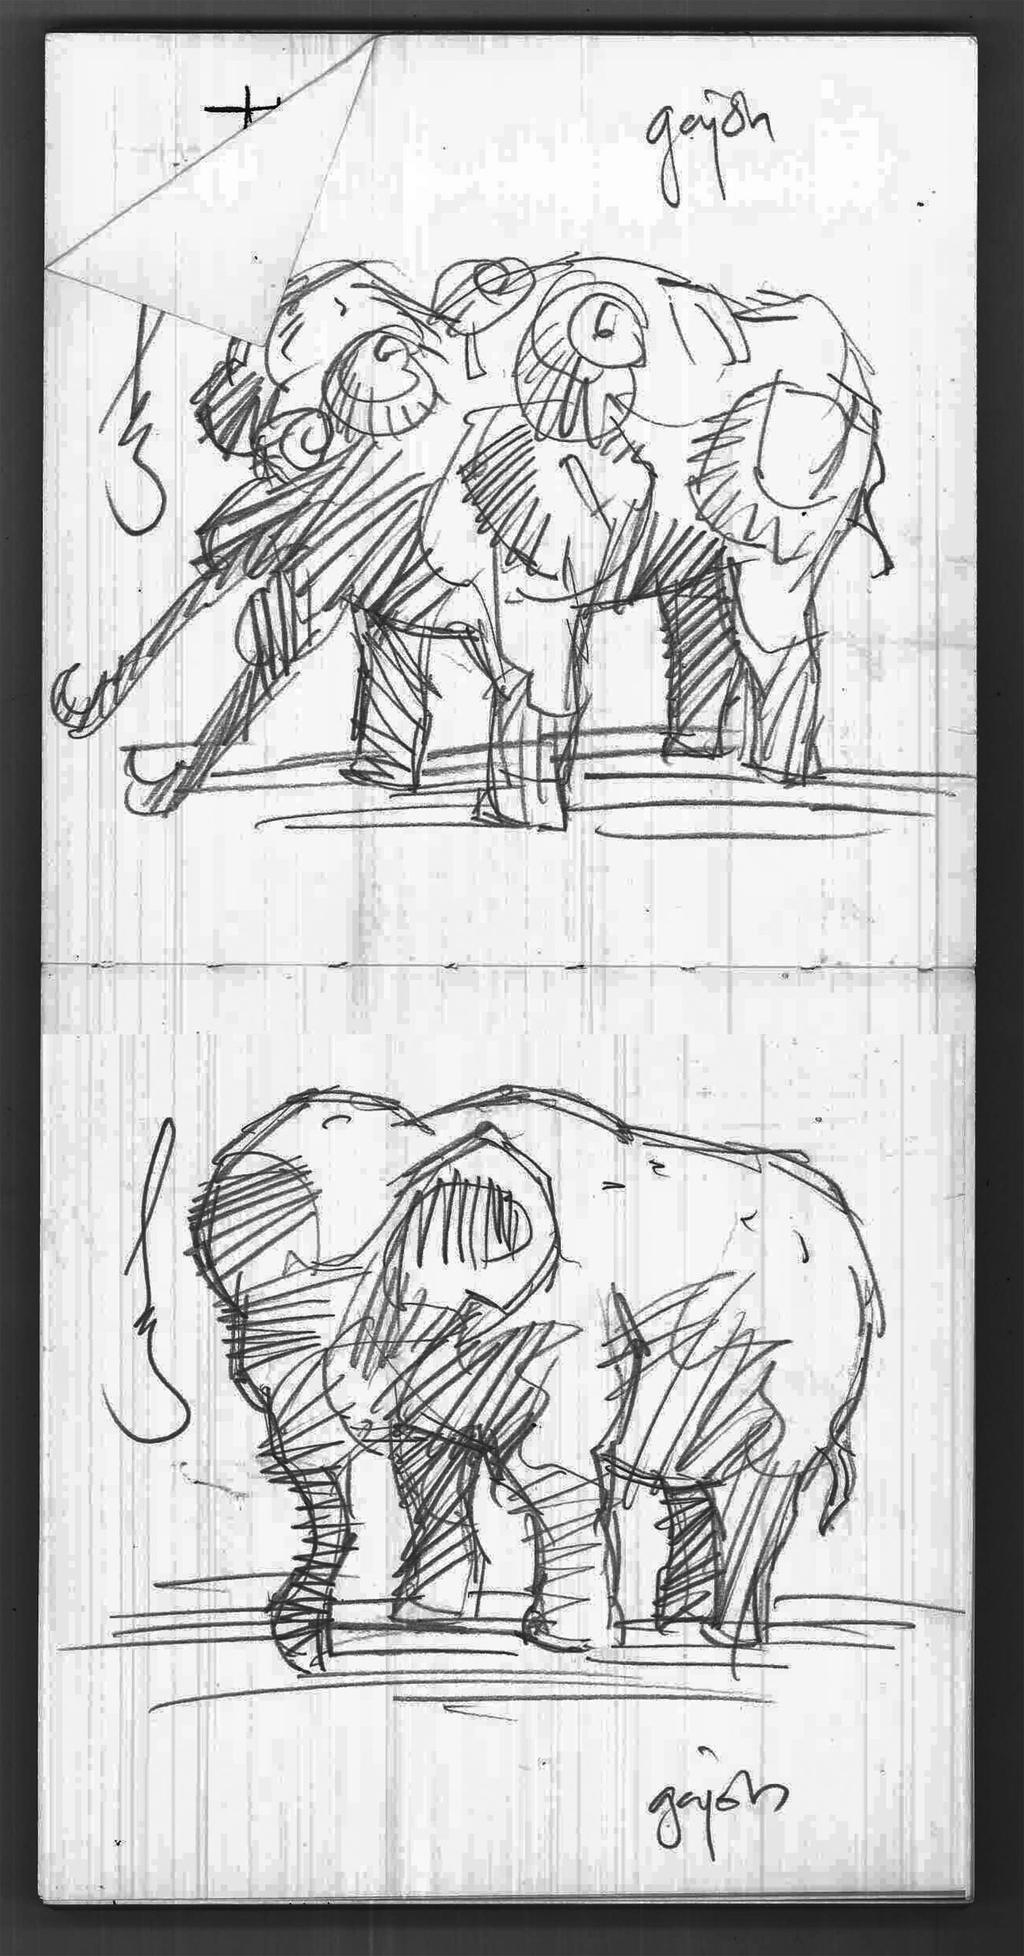 elephant_by_hasrulggk-d7x5ekk.jpg